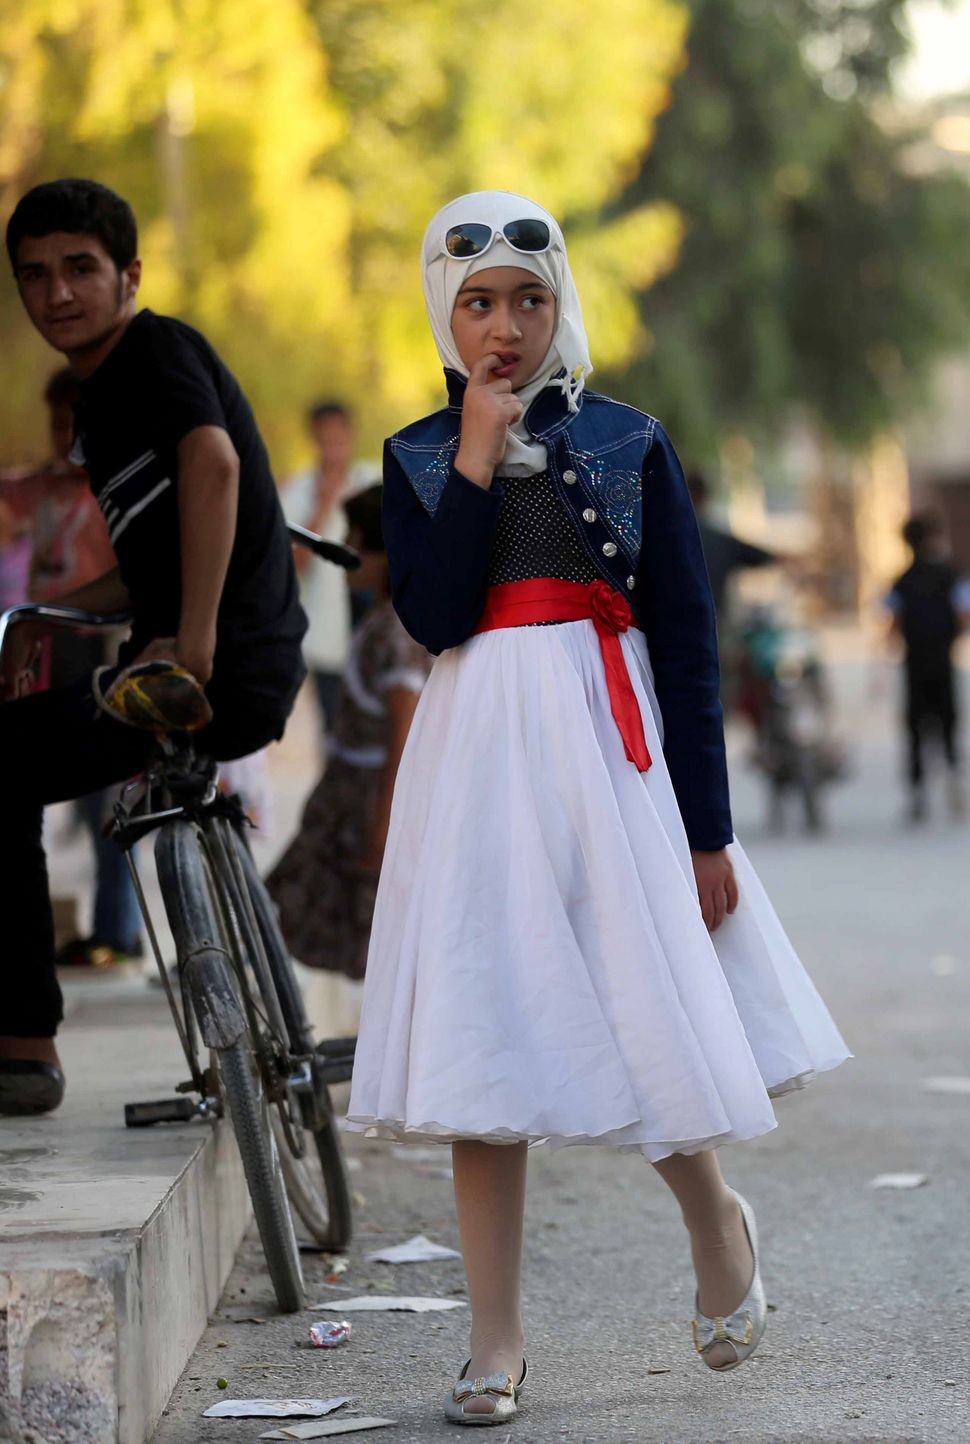 A Syrian girl walks in the street in Arbin.